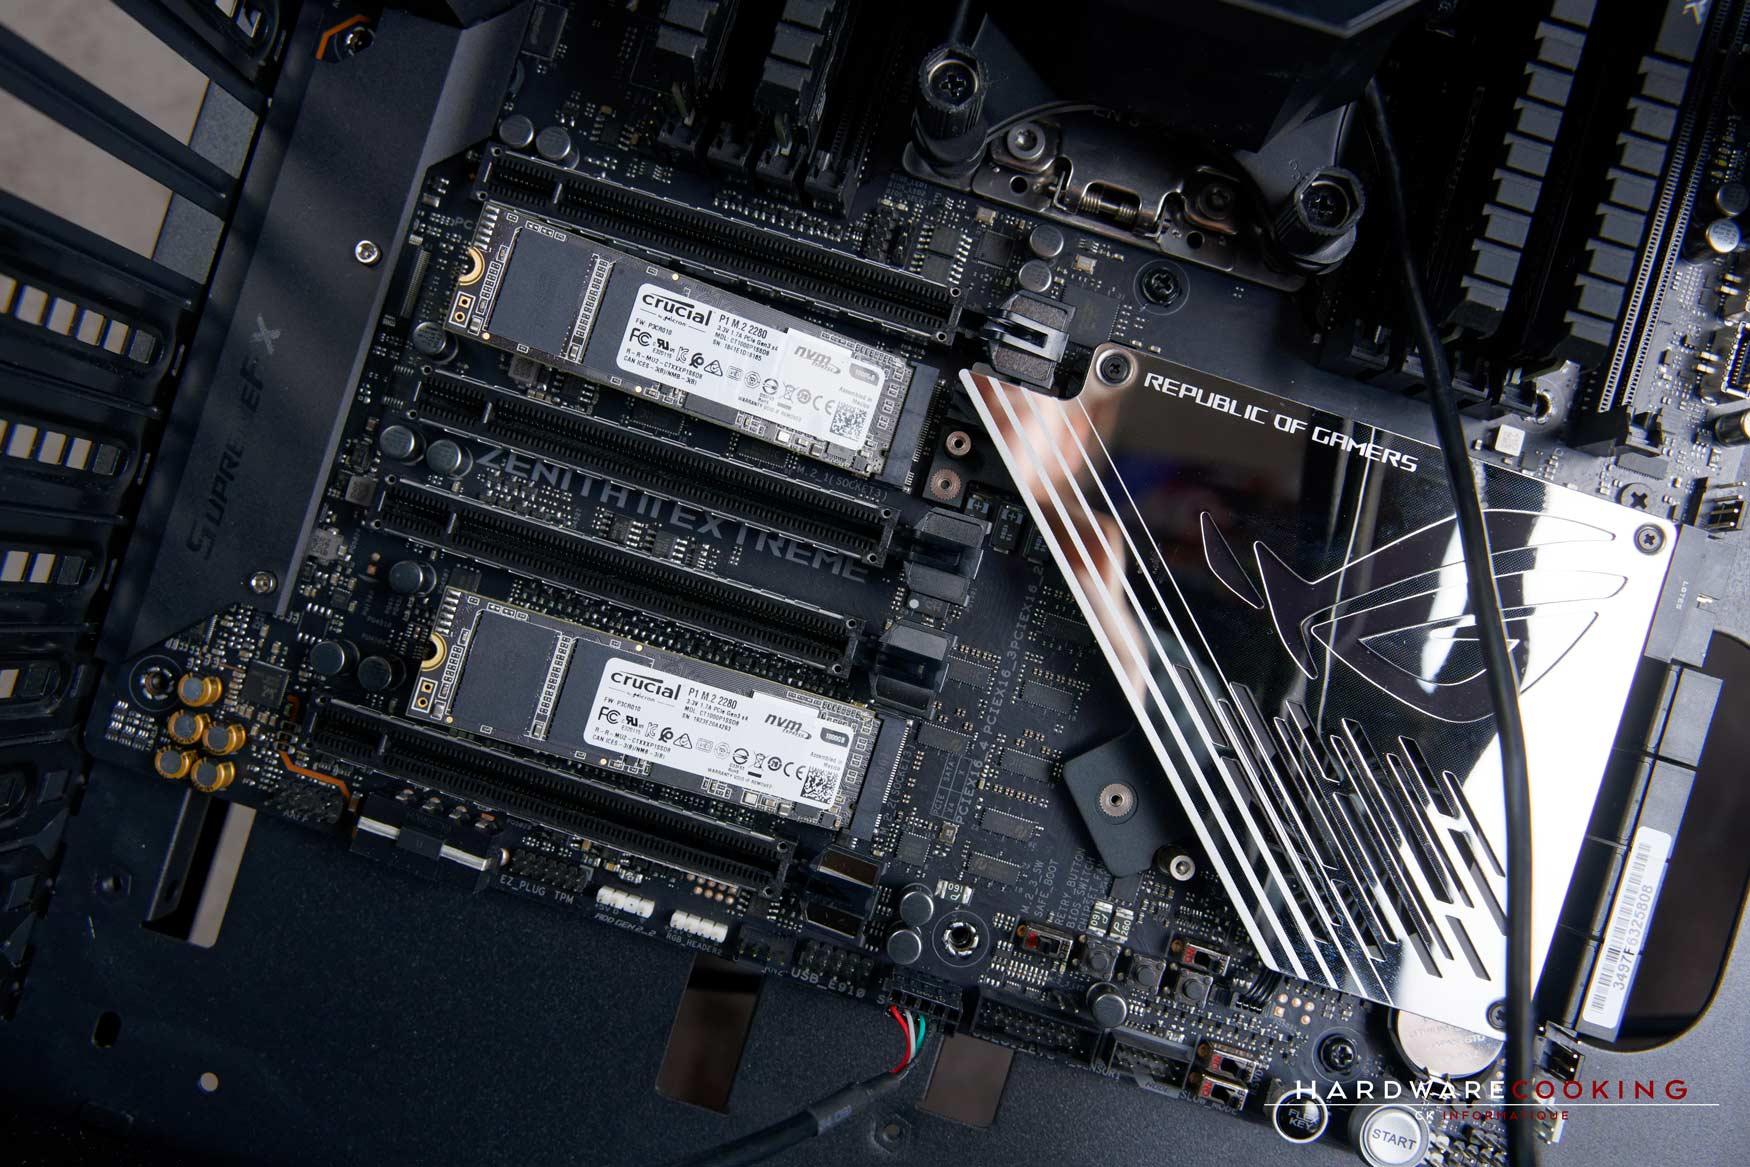 Installation SSD M.2